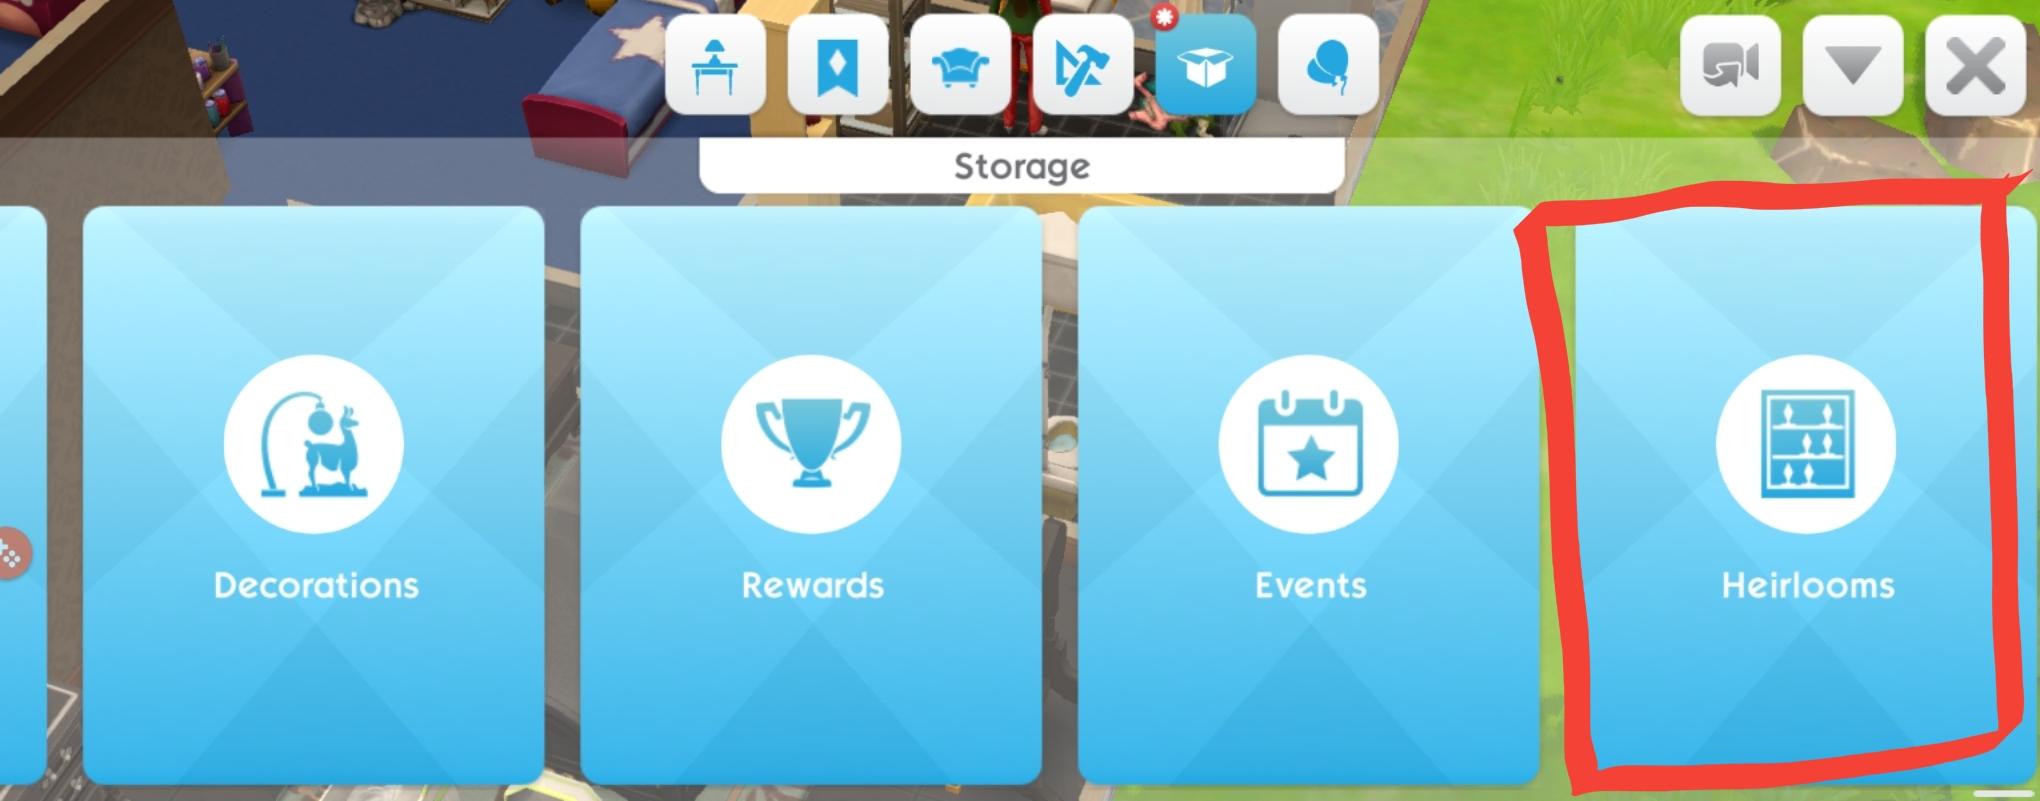 Screenshot_20191210-205018_The Sims.jpg